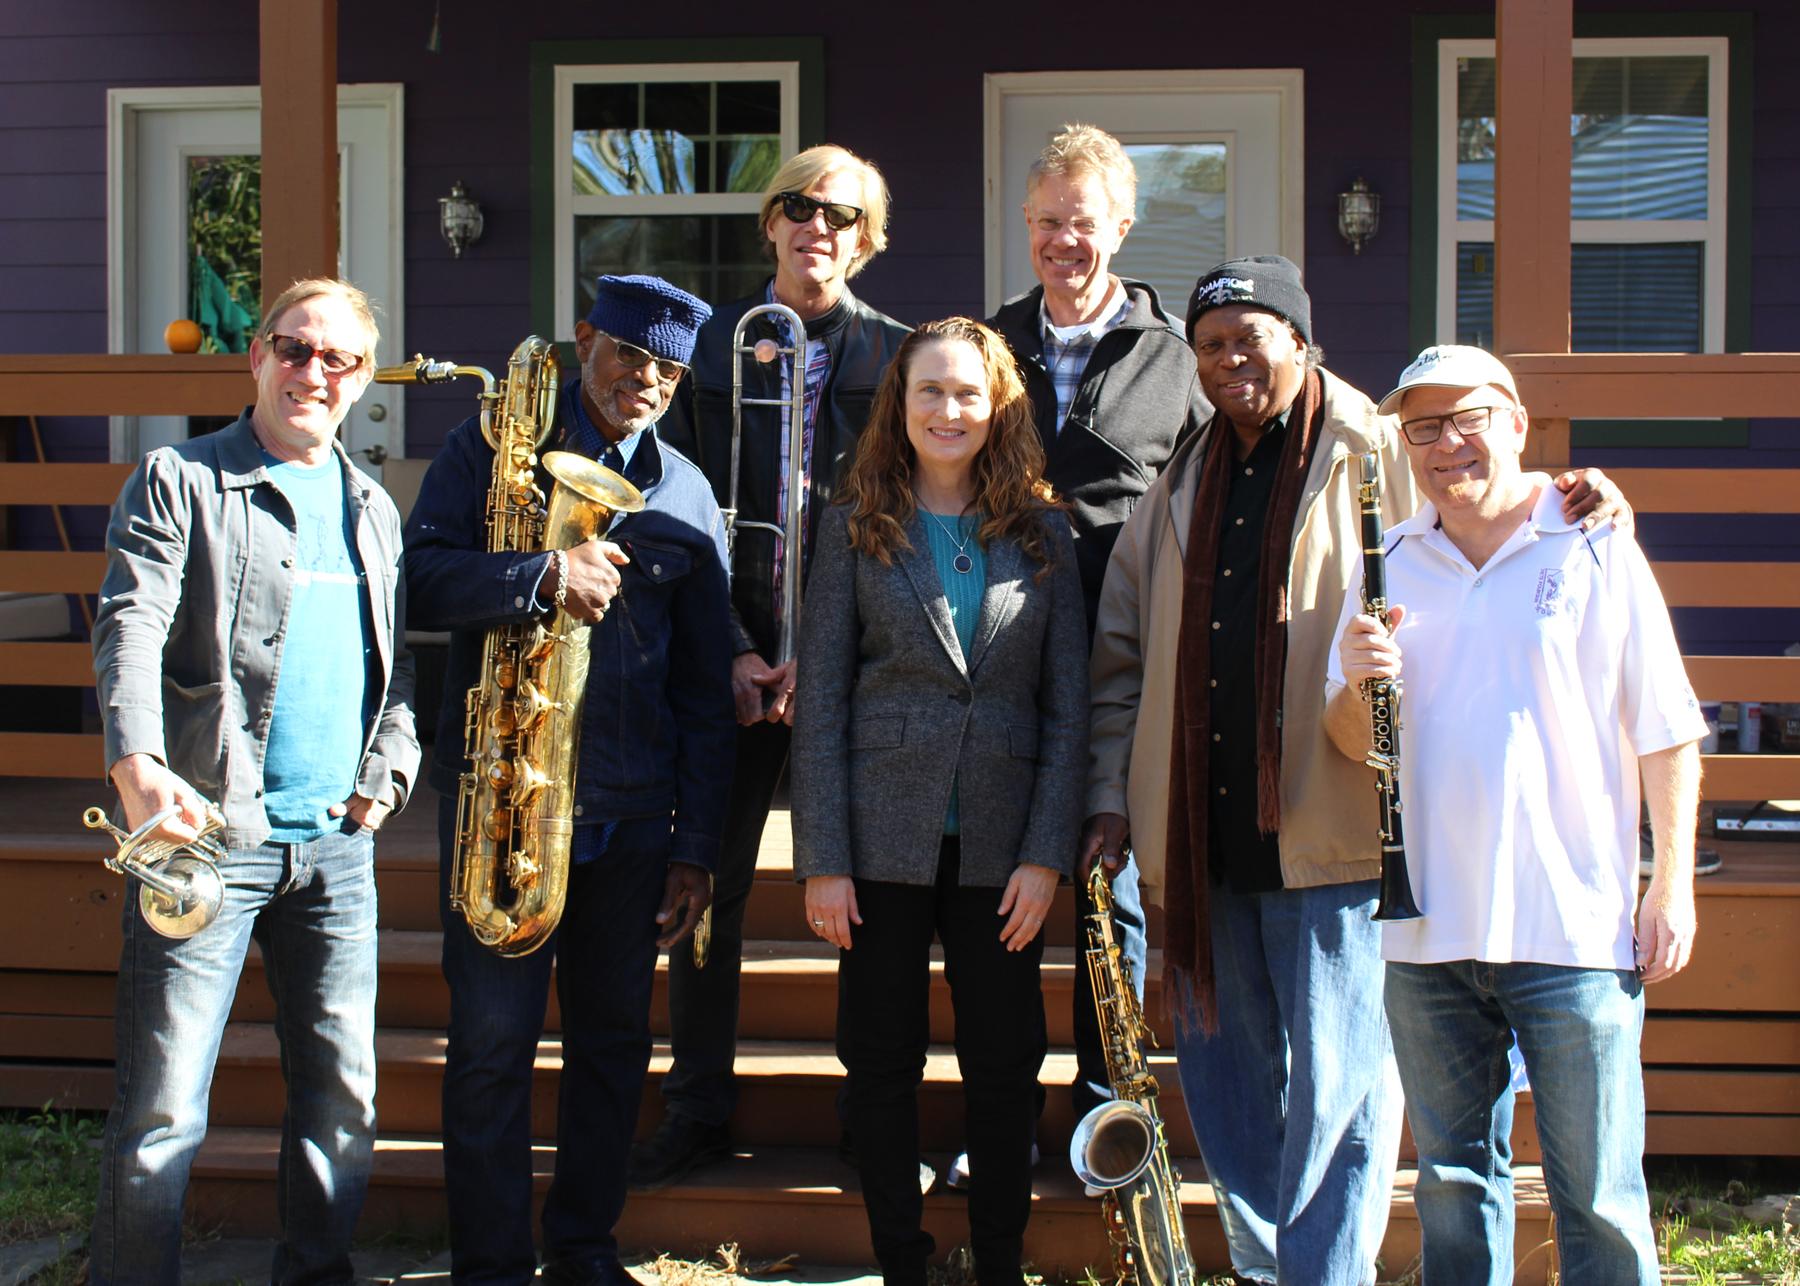 At our  Swamp Romp  recording sessions - (L-R) Kevin Clark, Roger Lewis, Craig Klein, Johnette Downing, Scott Billington, Kevin Harris and Tim Laughlin.